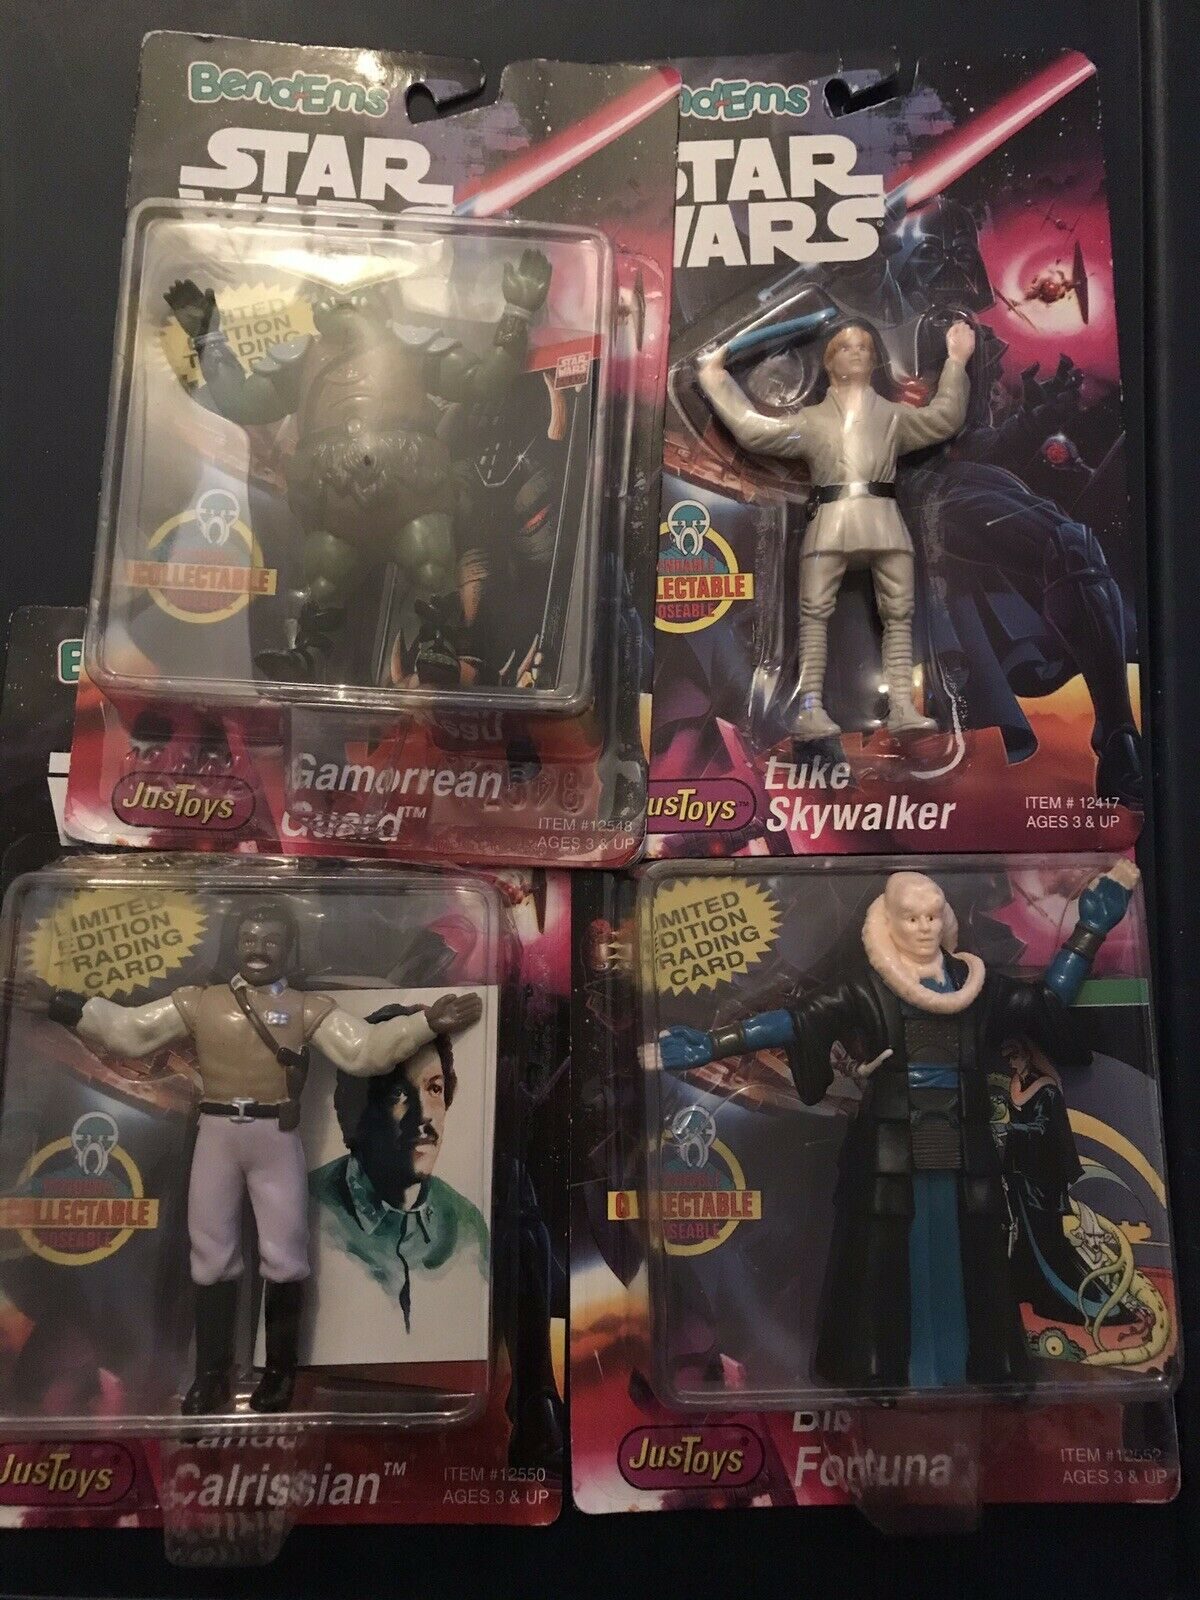 Star Wars Bend-Ems Luke Skywalker, Lando Calrissian, Bib Fortuna, and Guard